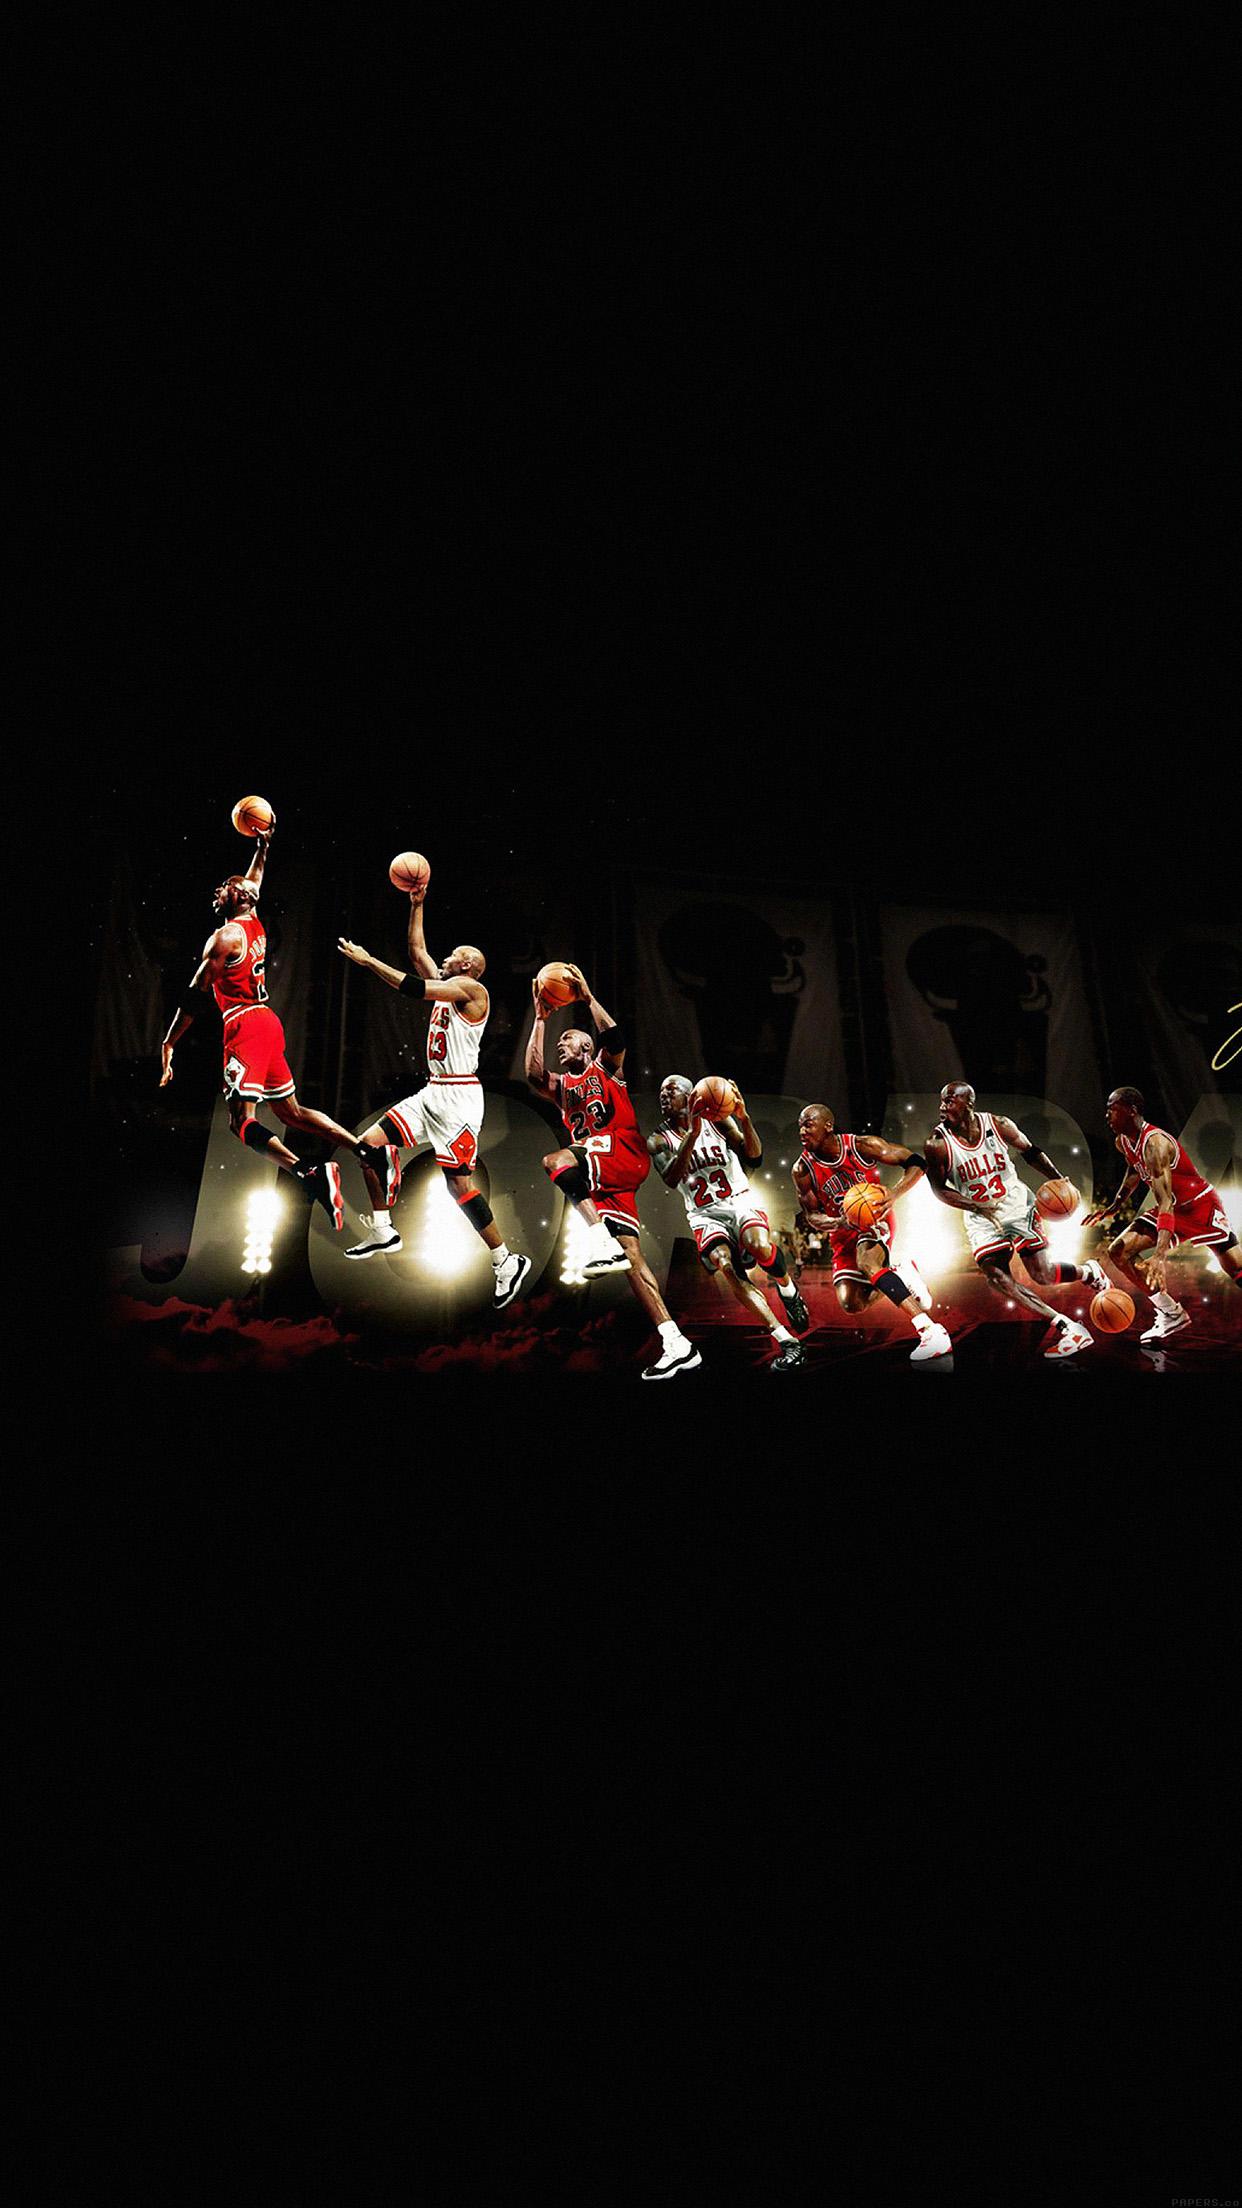 Iphone7papers Hd30 Michael Jordan Dunk Legend Nba Sports